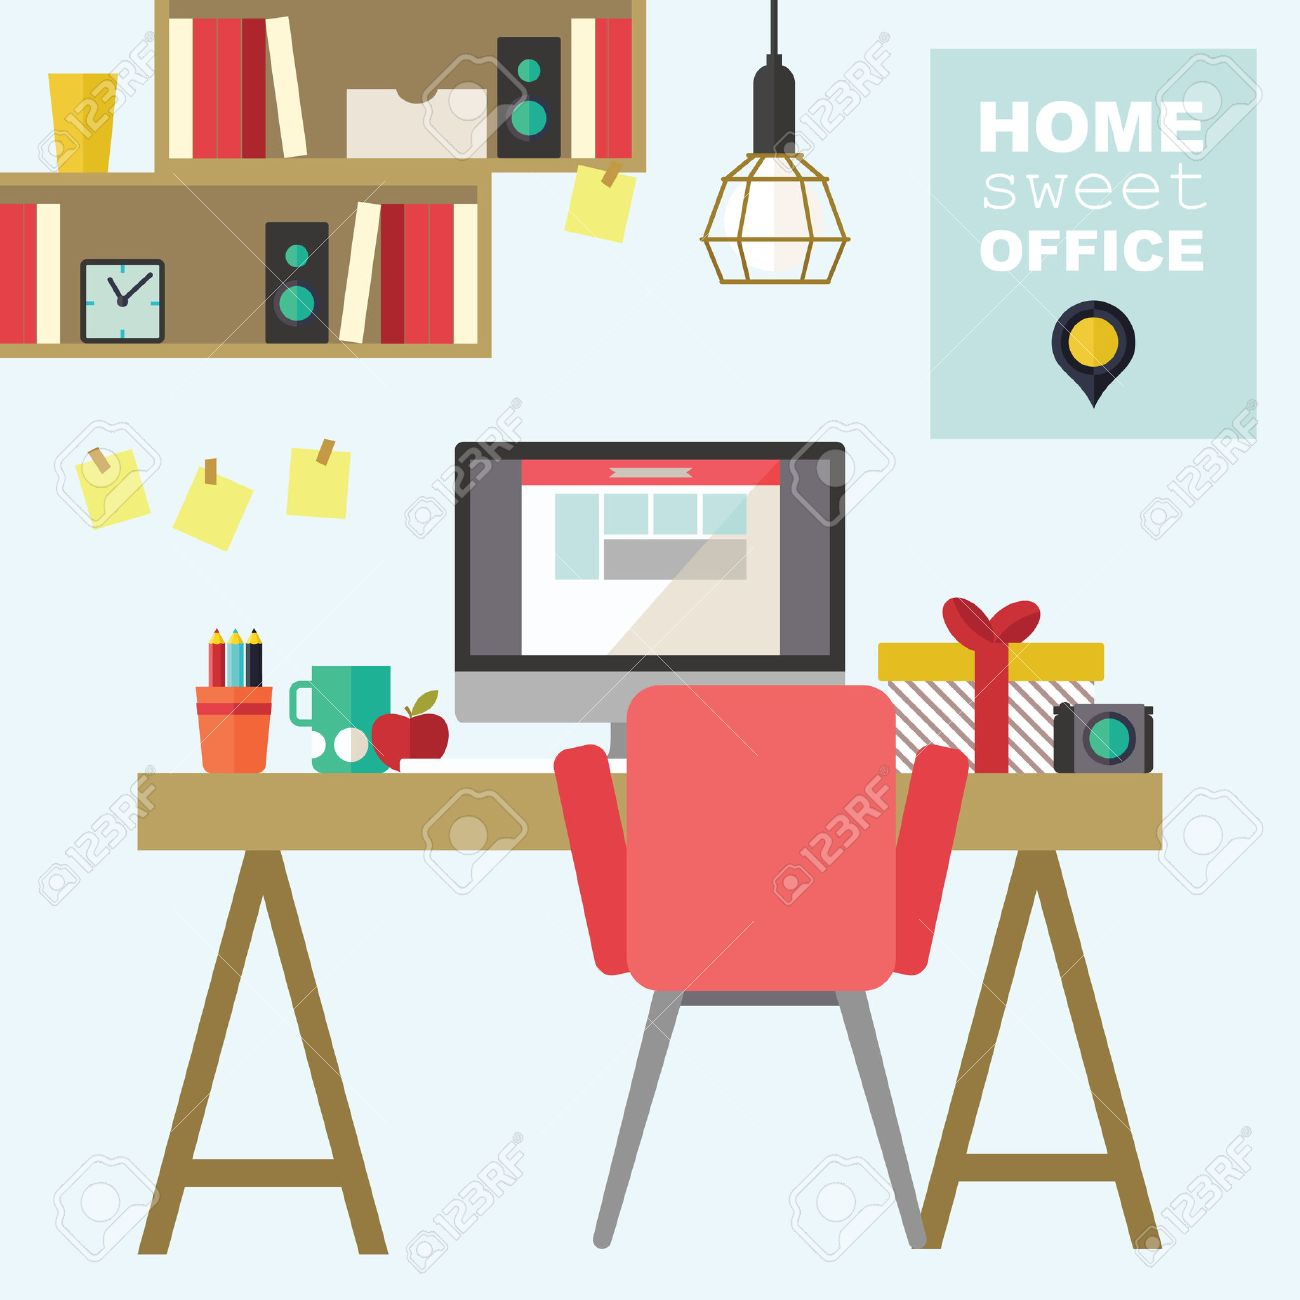 Home office flat interior design illustration.